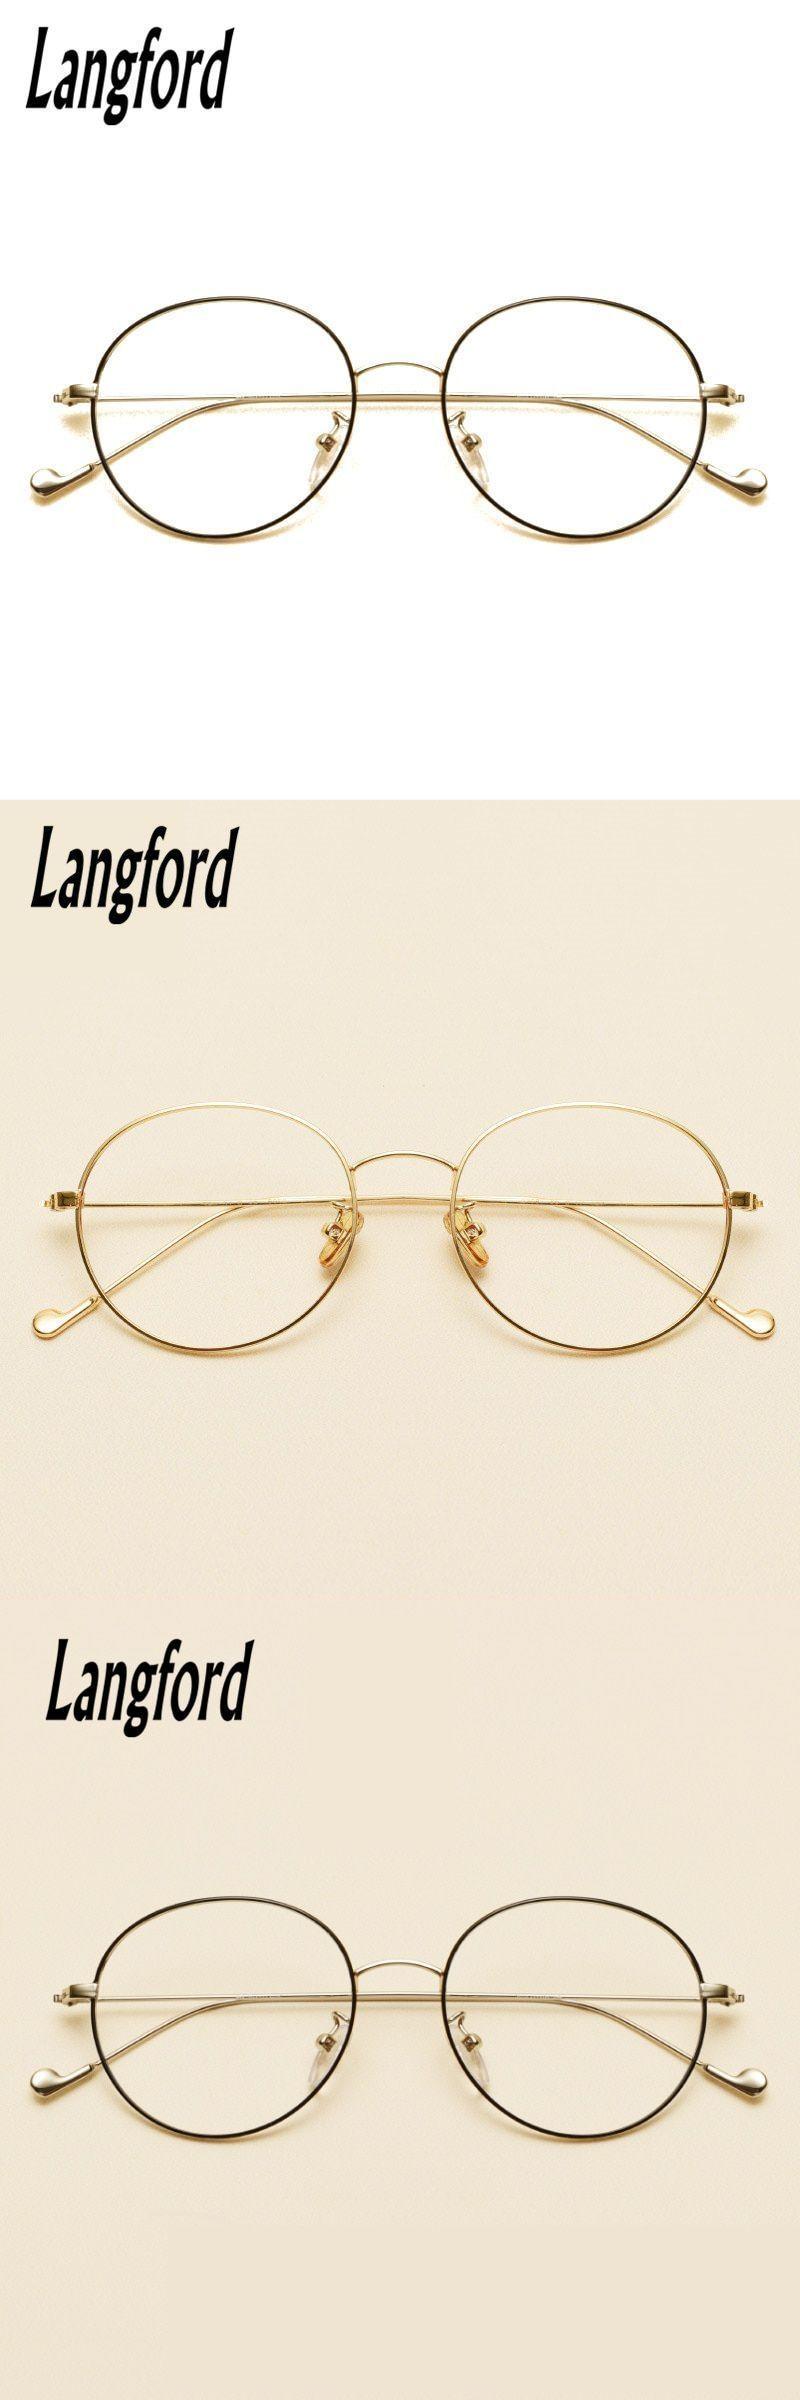 680e74e946 Brand vintage round optical frames big hipster glasses slim light round  eyeglasses frame gold prescription 2708  eyewear  accessories  frames   women  solid ...